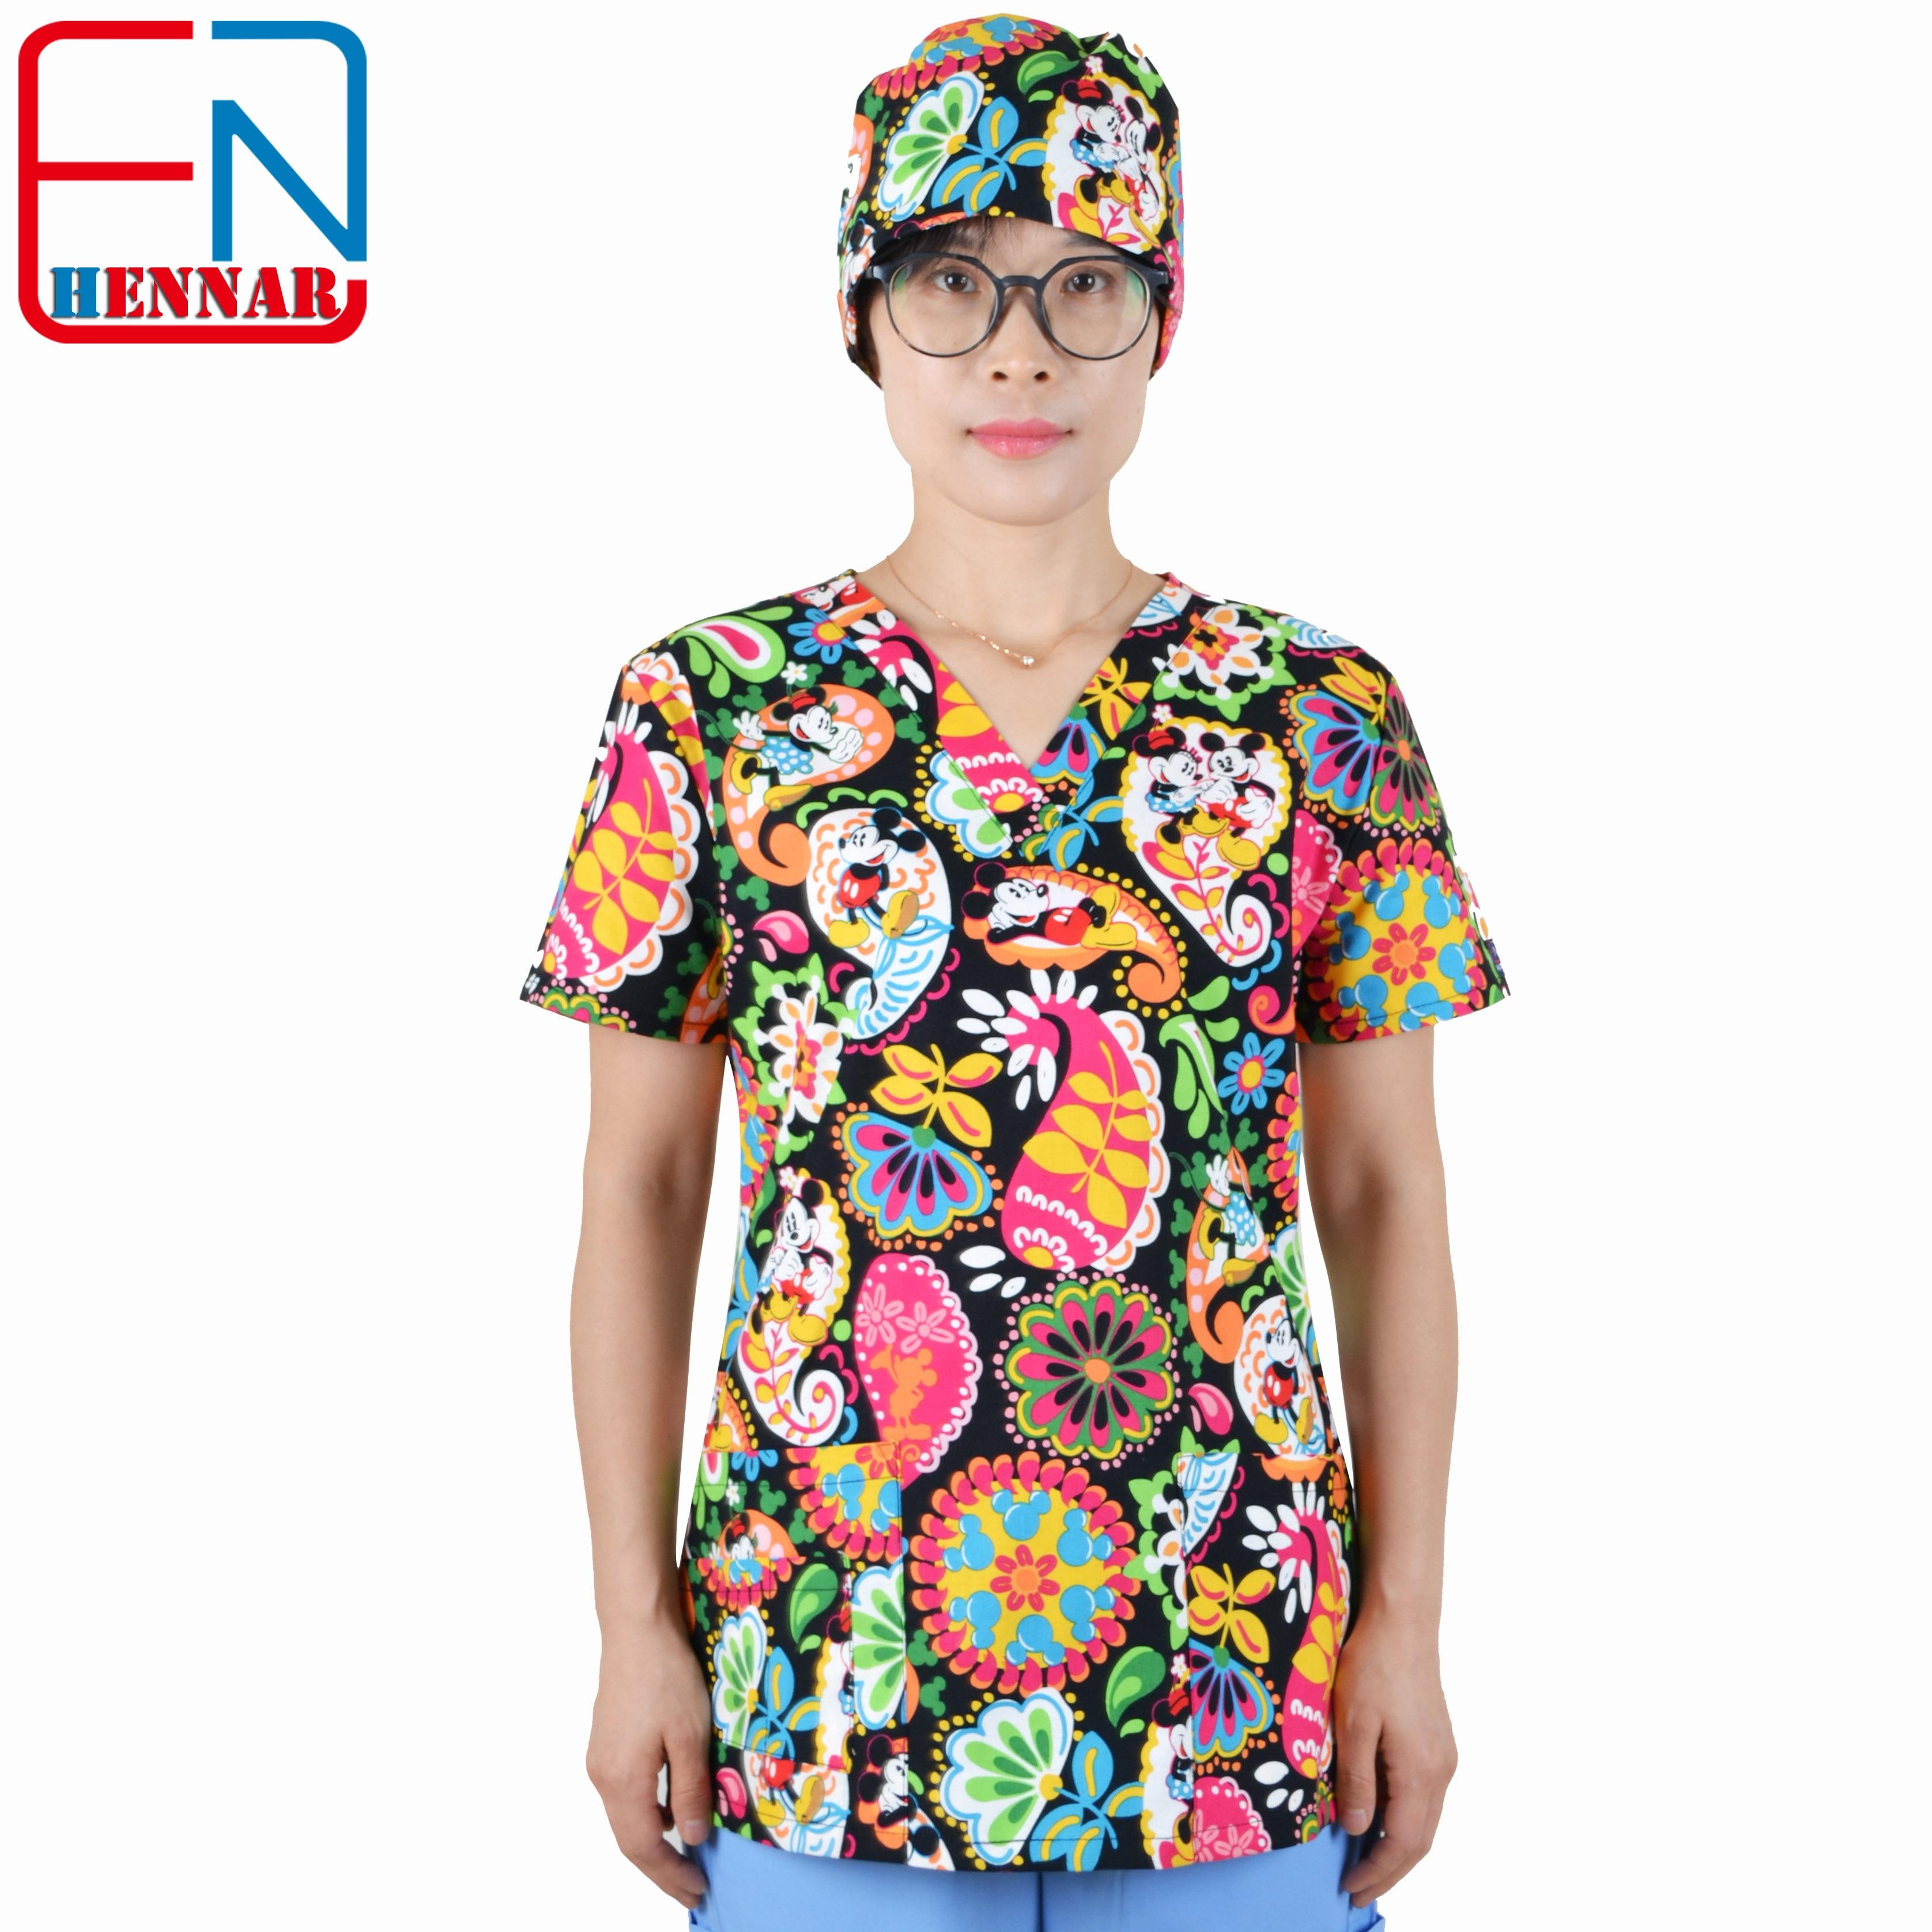 Hennar Medical Scrubs Nursing Scrubs Women Scrubs Nurse Medical Uniformes Medicos Para Mujer Scrub Tops+ Caps